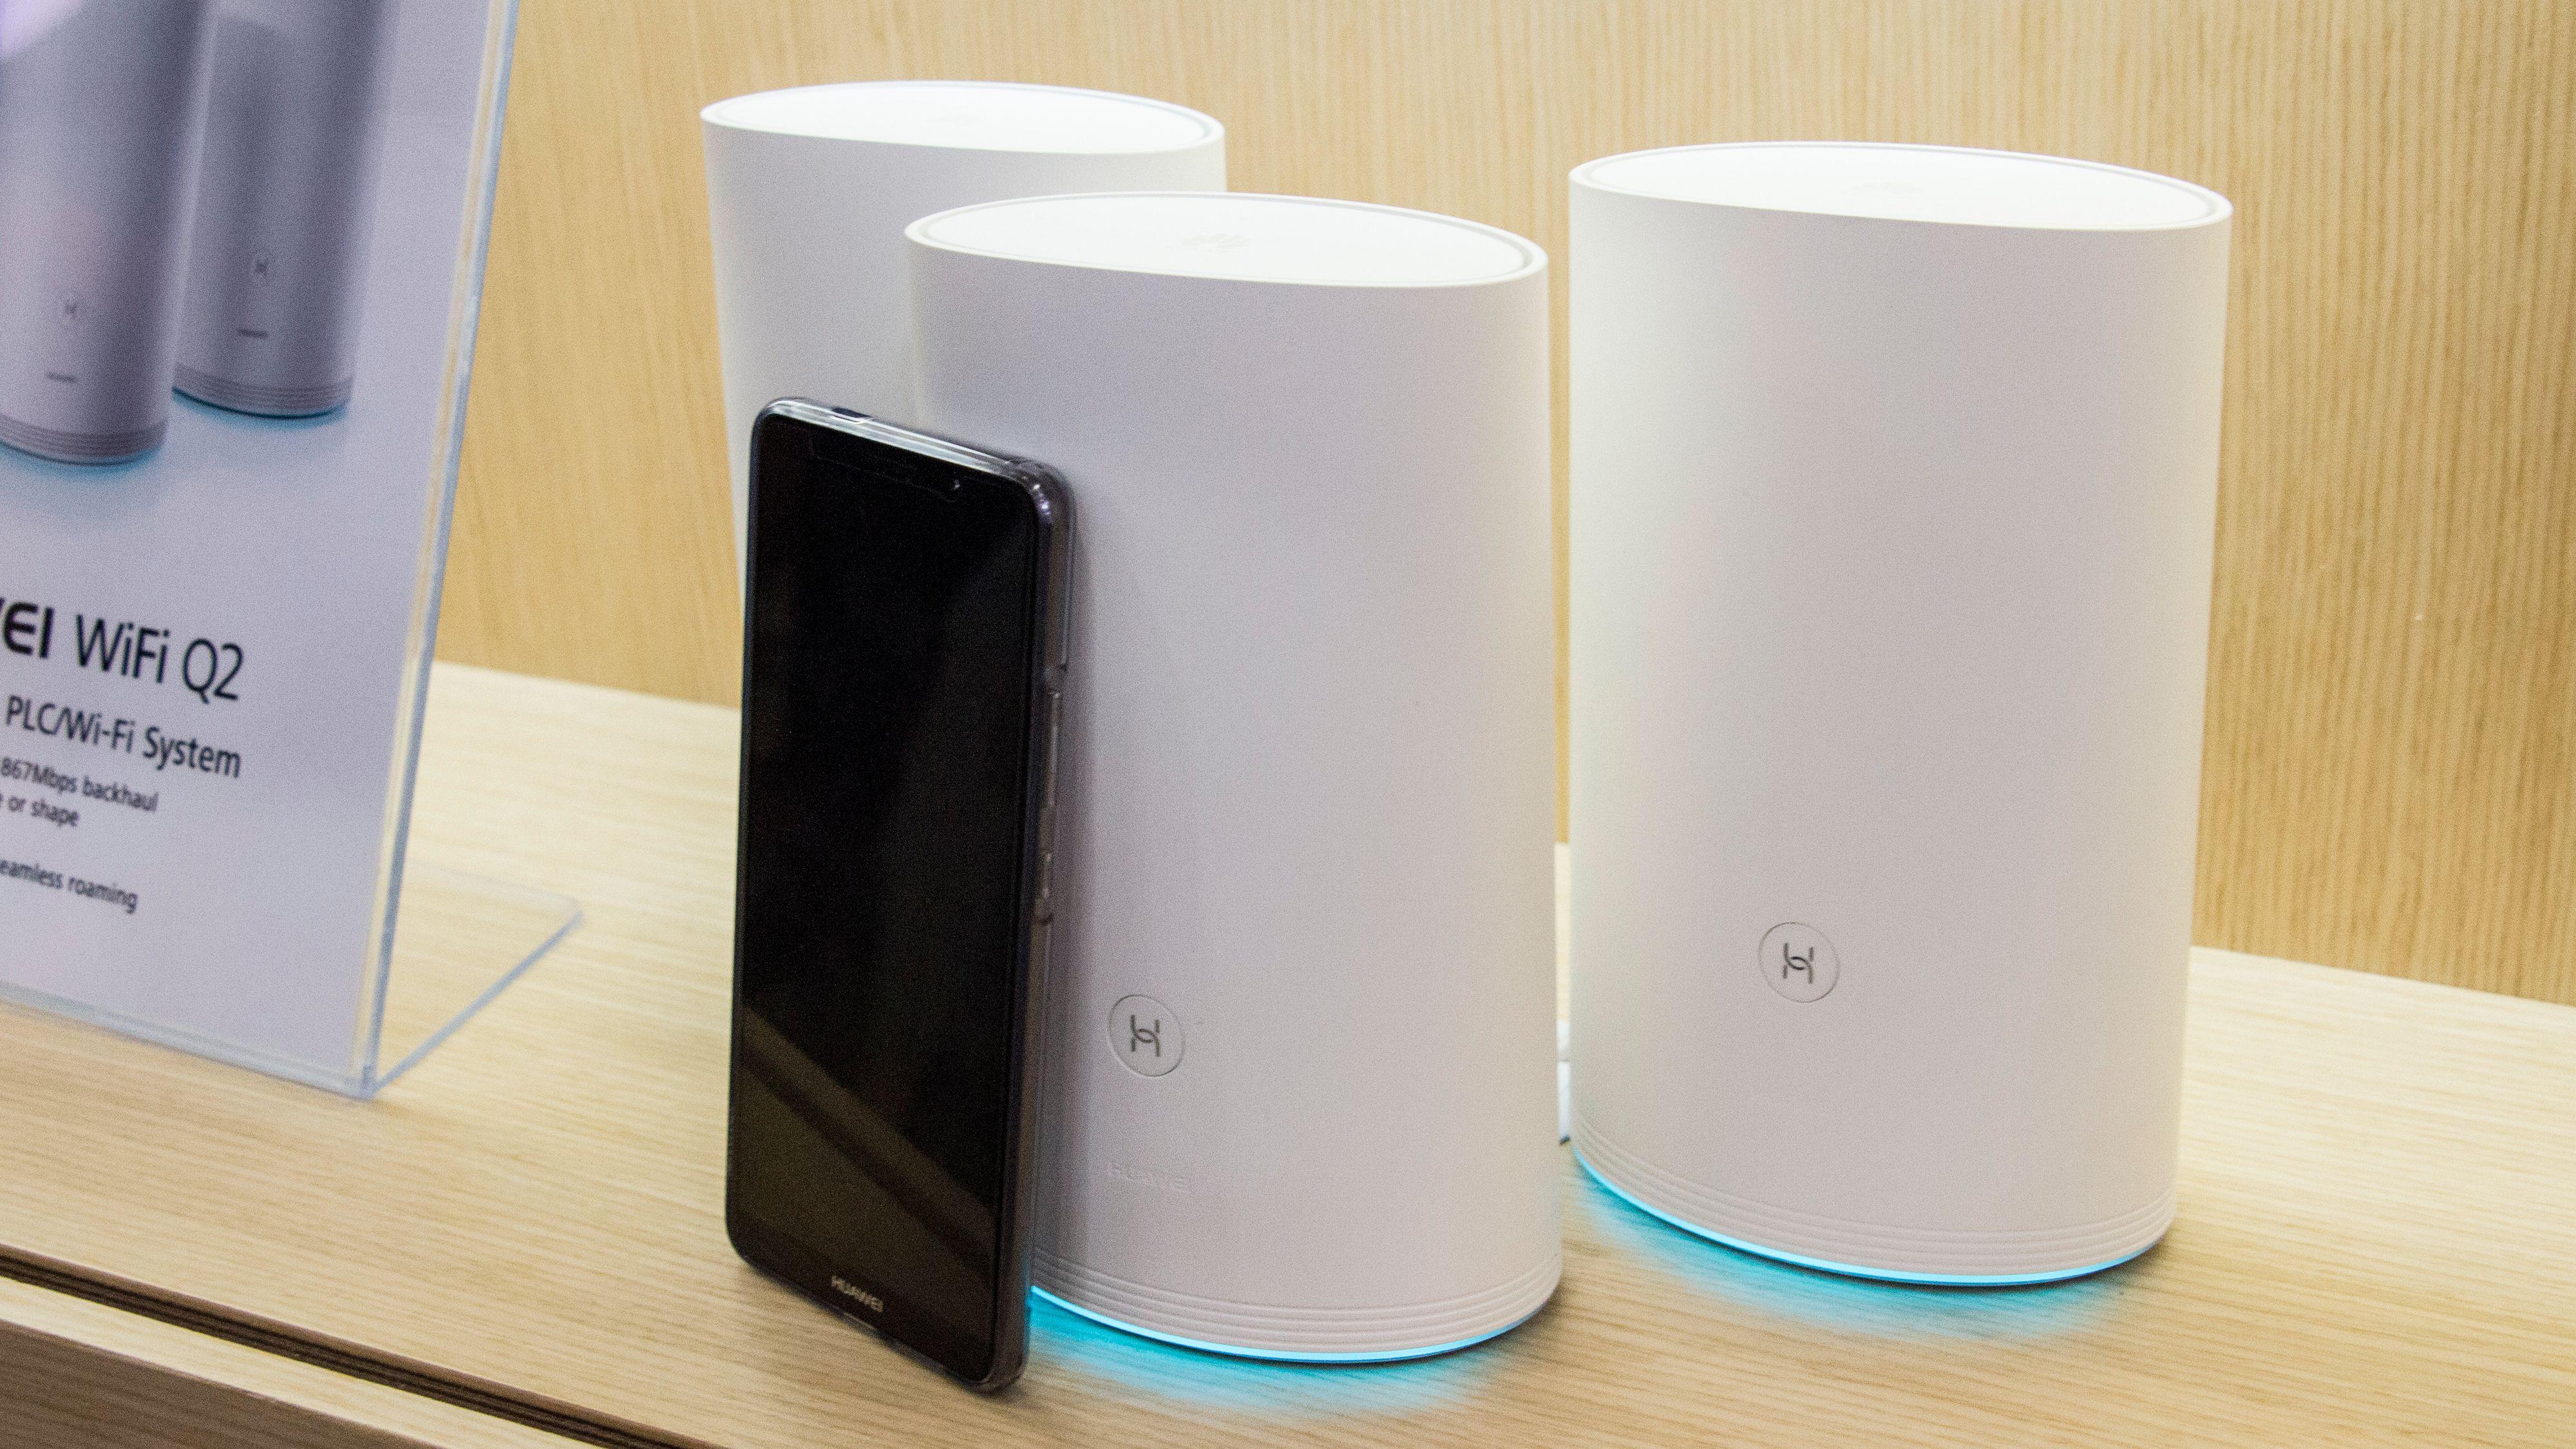 Systemet fås også i en pakke med tre baseenheter. Disse vil kunne kombinere strømlinjeoverføring og trådløs overføring. Her sammen med en Huawei Mate 10 Pro for skala.